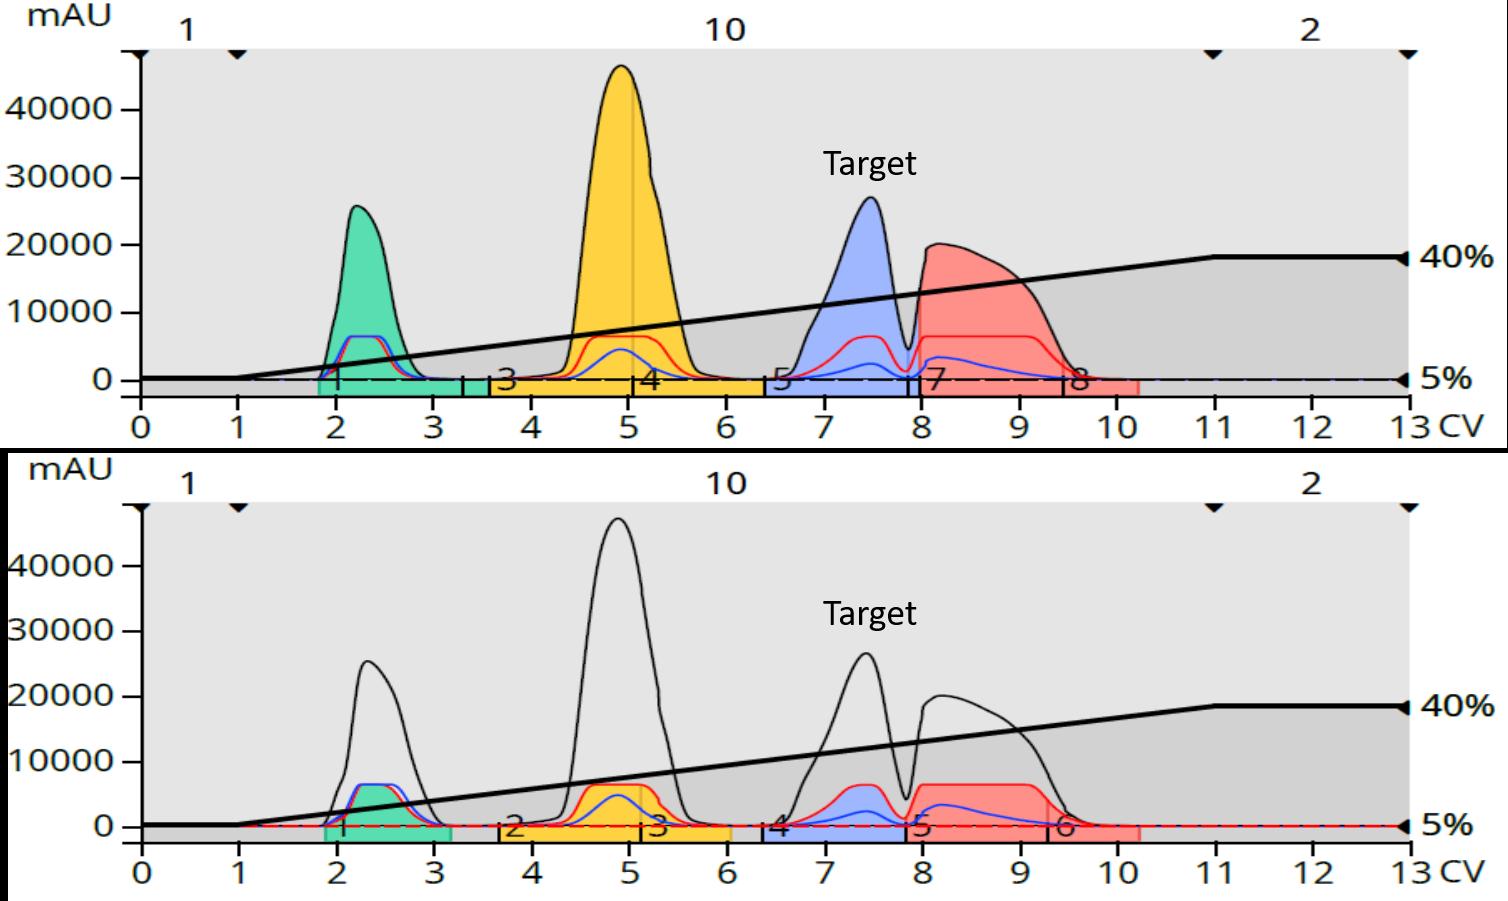 800 mg load detection comparison 2